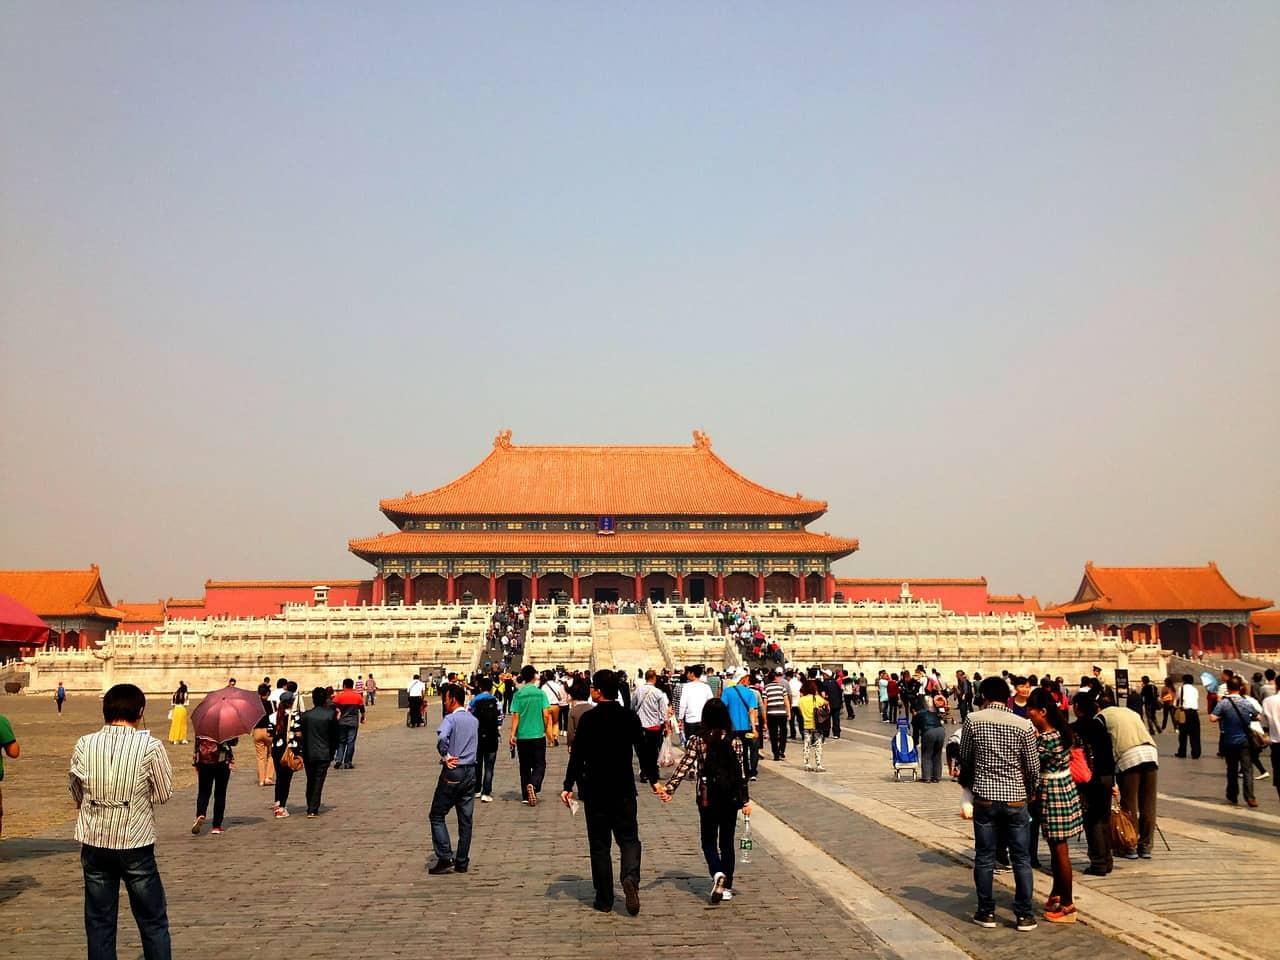 Bejing China - world traveler club